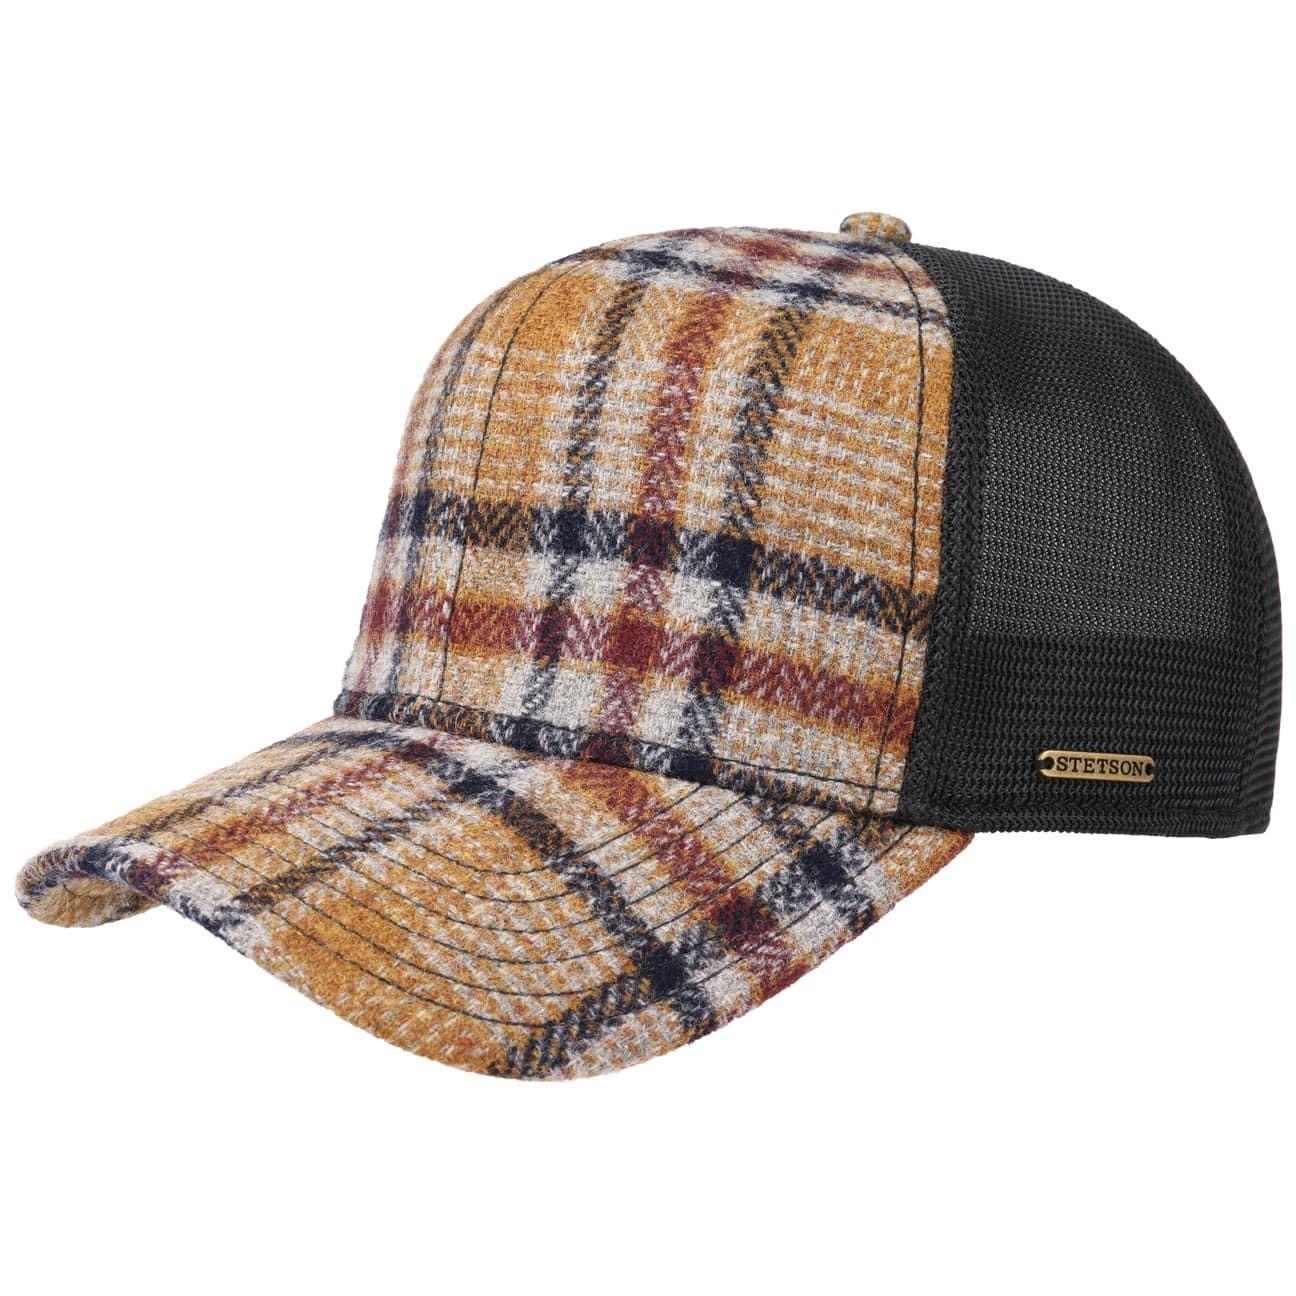 Woolrich Check Truckercap by Stetson